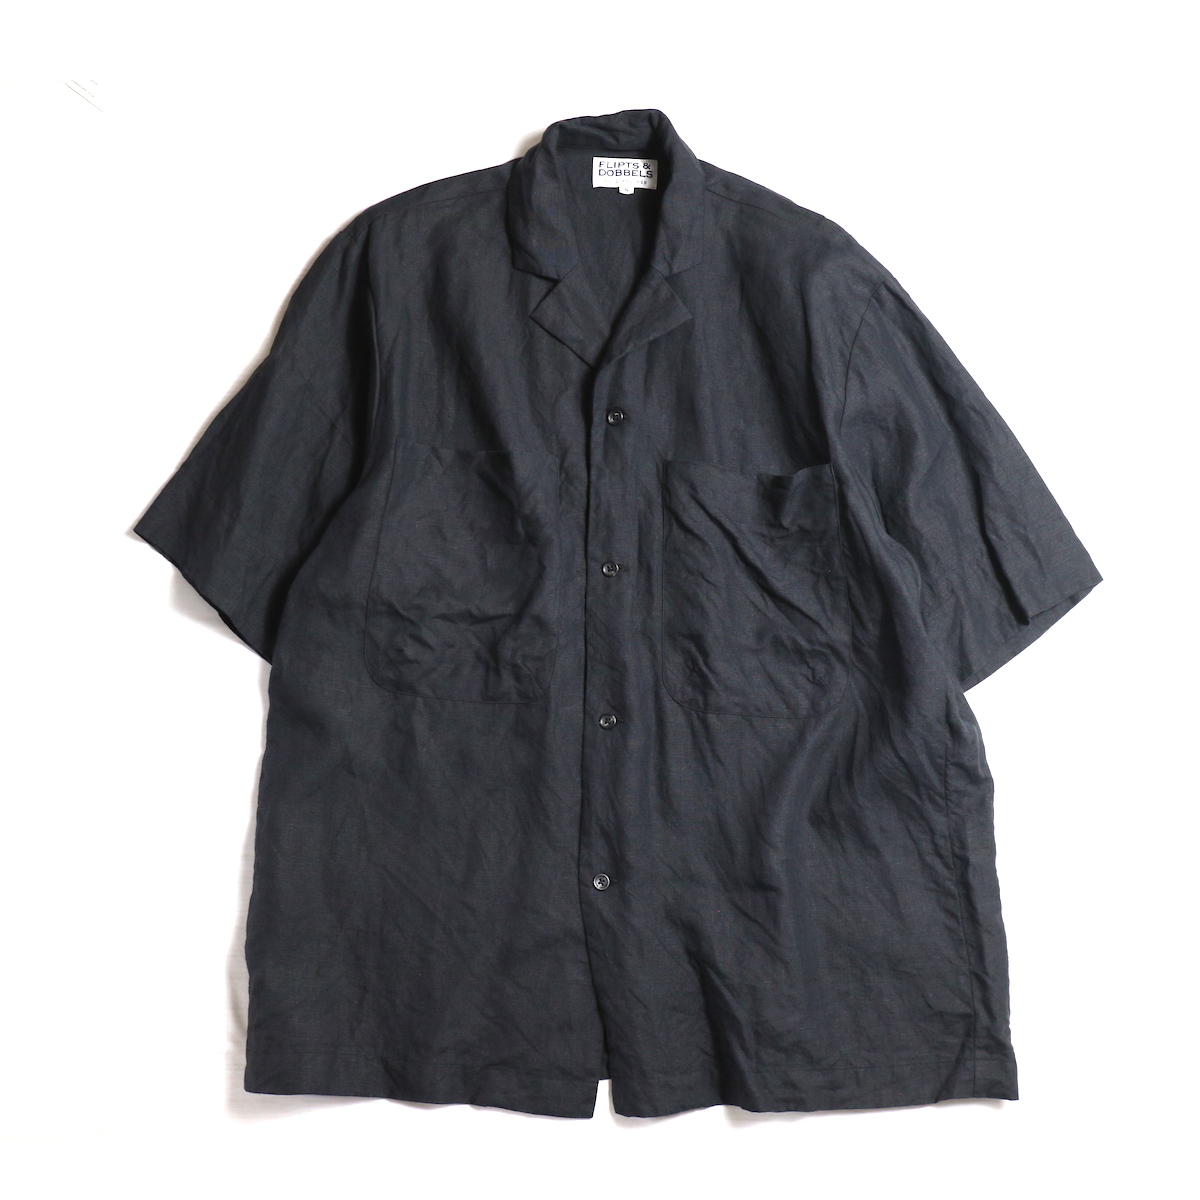 FLIPTS & DOBBELS /  Open S/S Shirts -Black